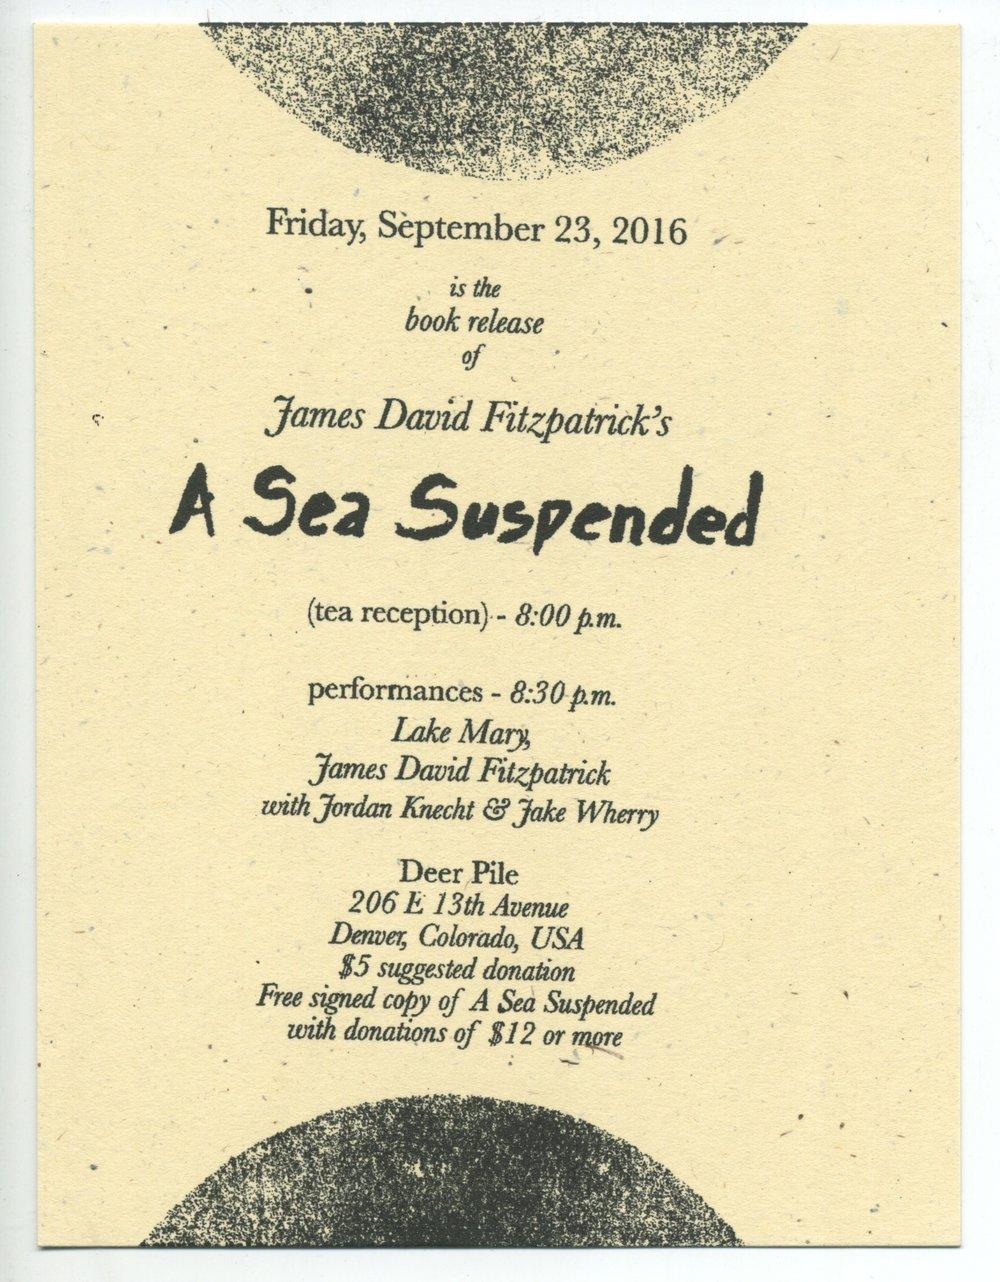 A Sea Suspended Flier.jpeg